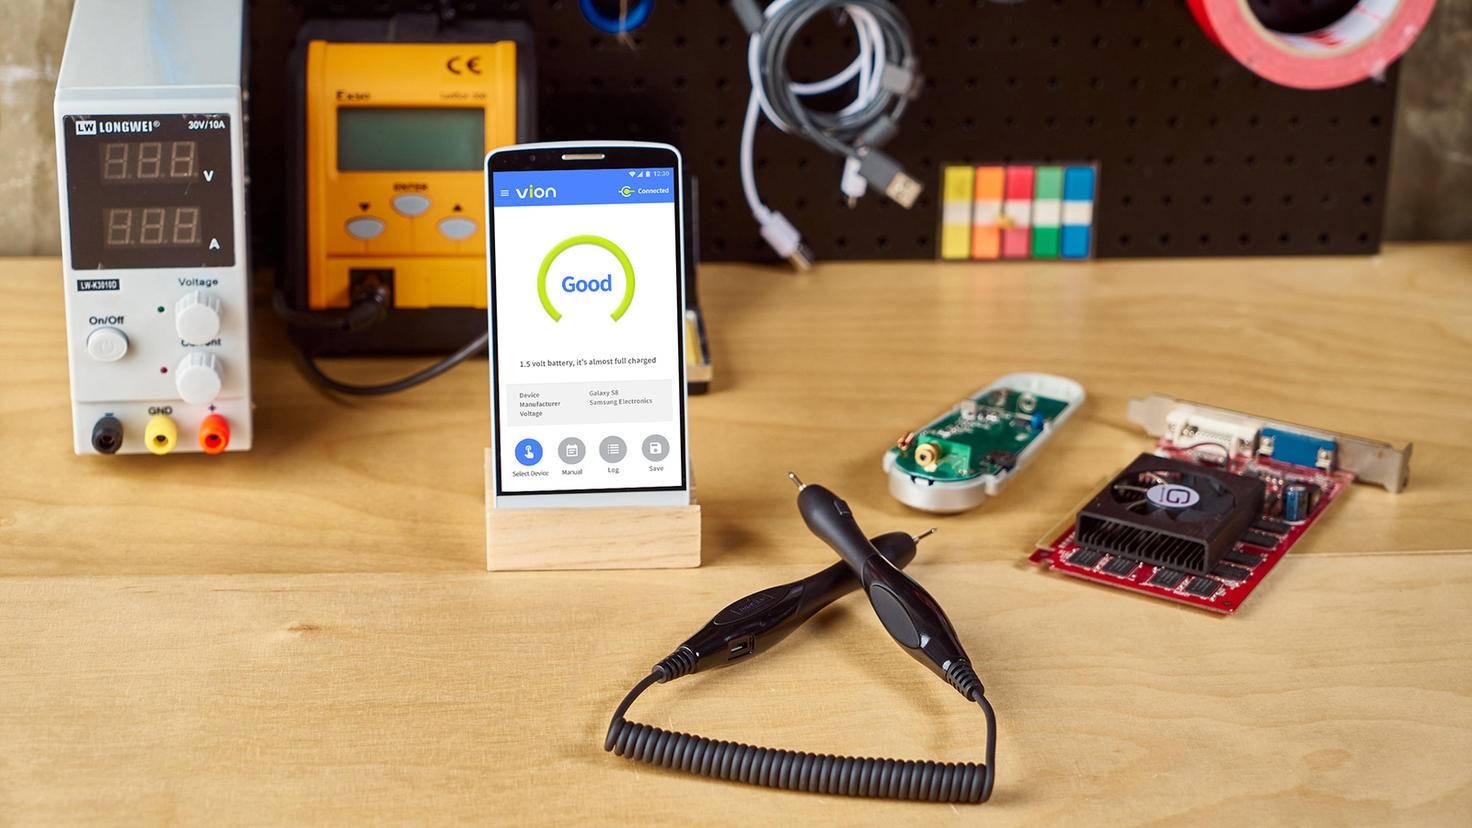 Vion Multimeter Kickstarter